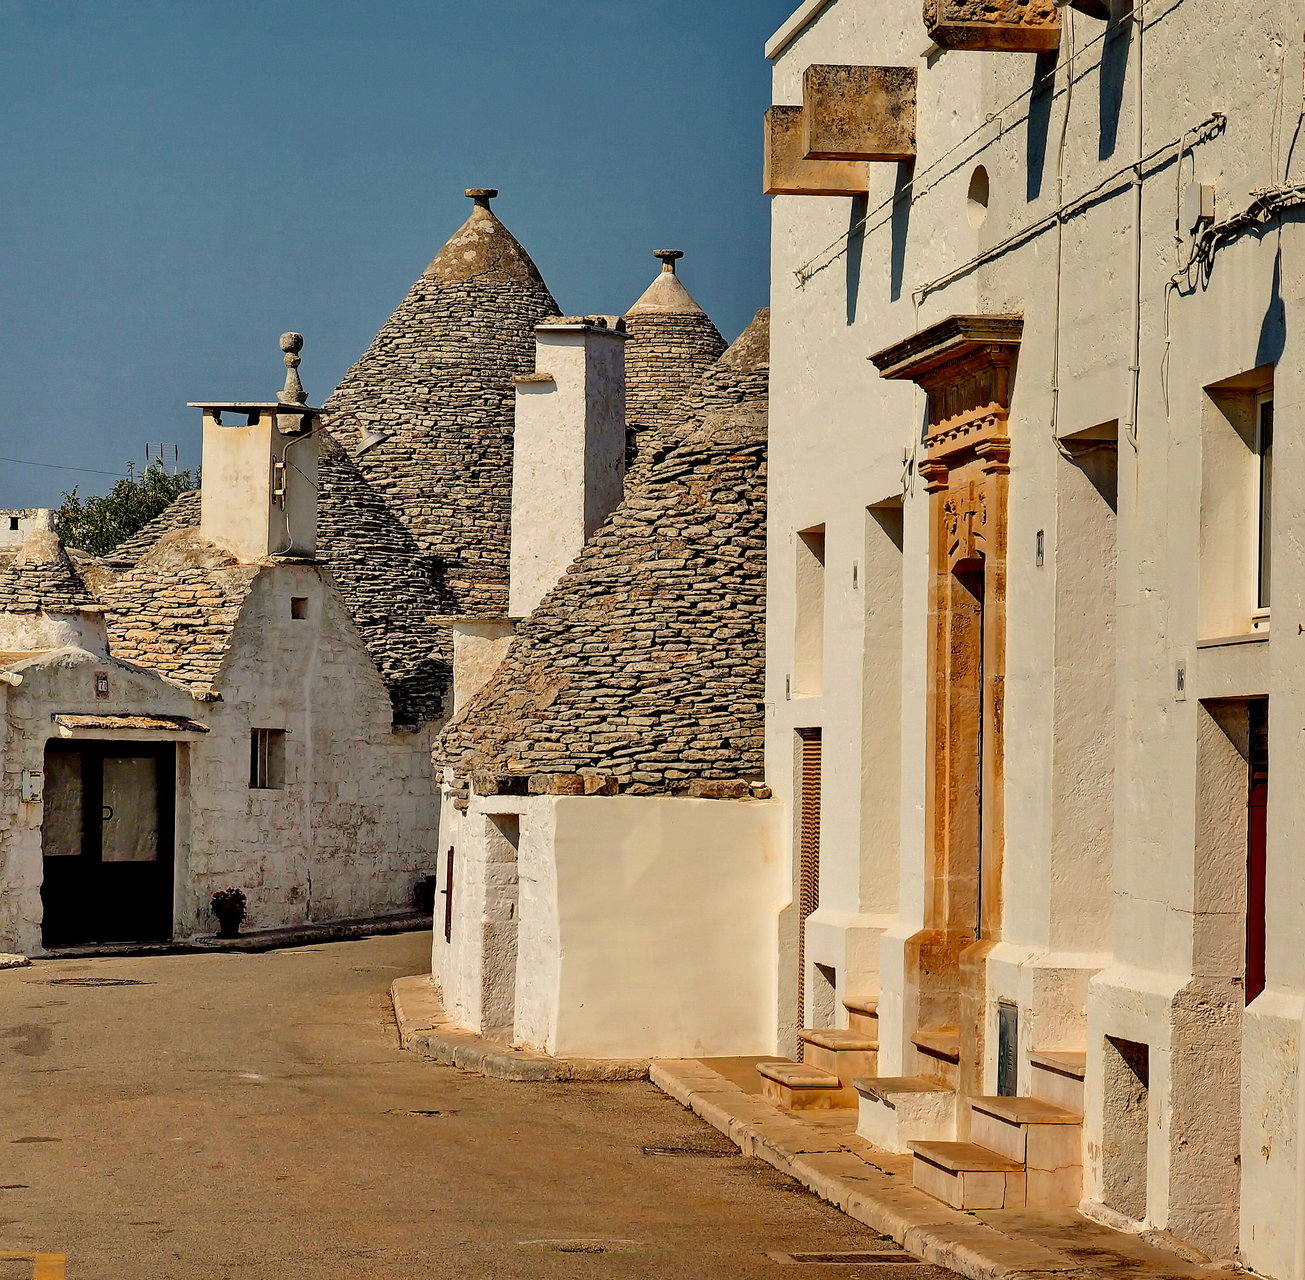 Alberobello | Author Георги Борисов - joroblg | PHOTO FORUM